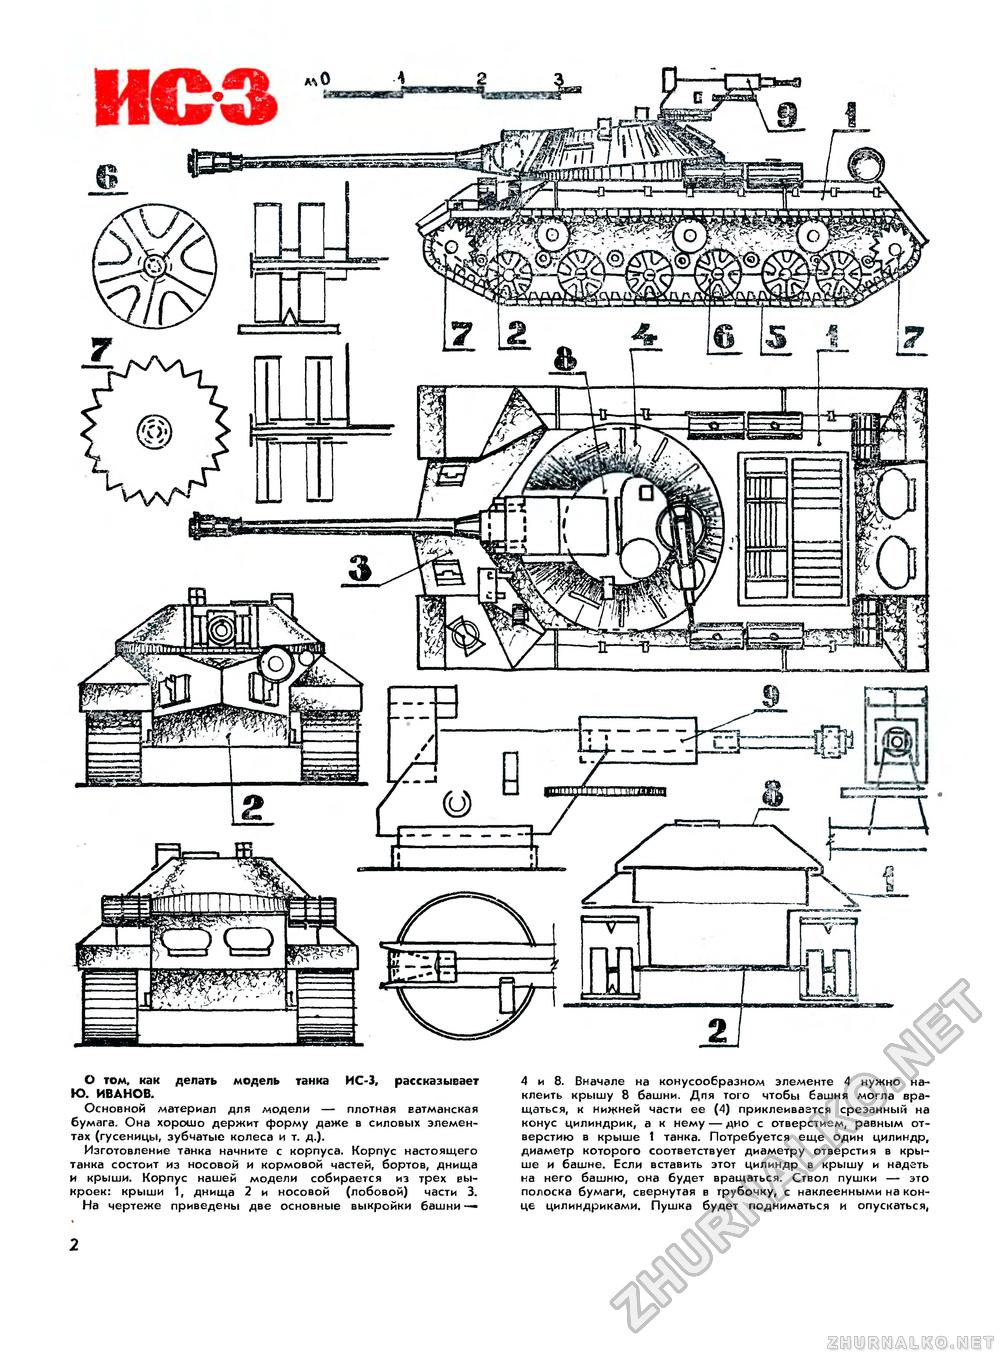 Чертежи моделей танков своими руками